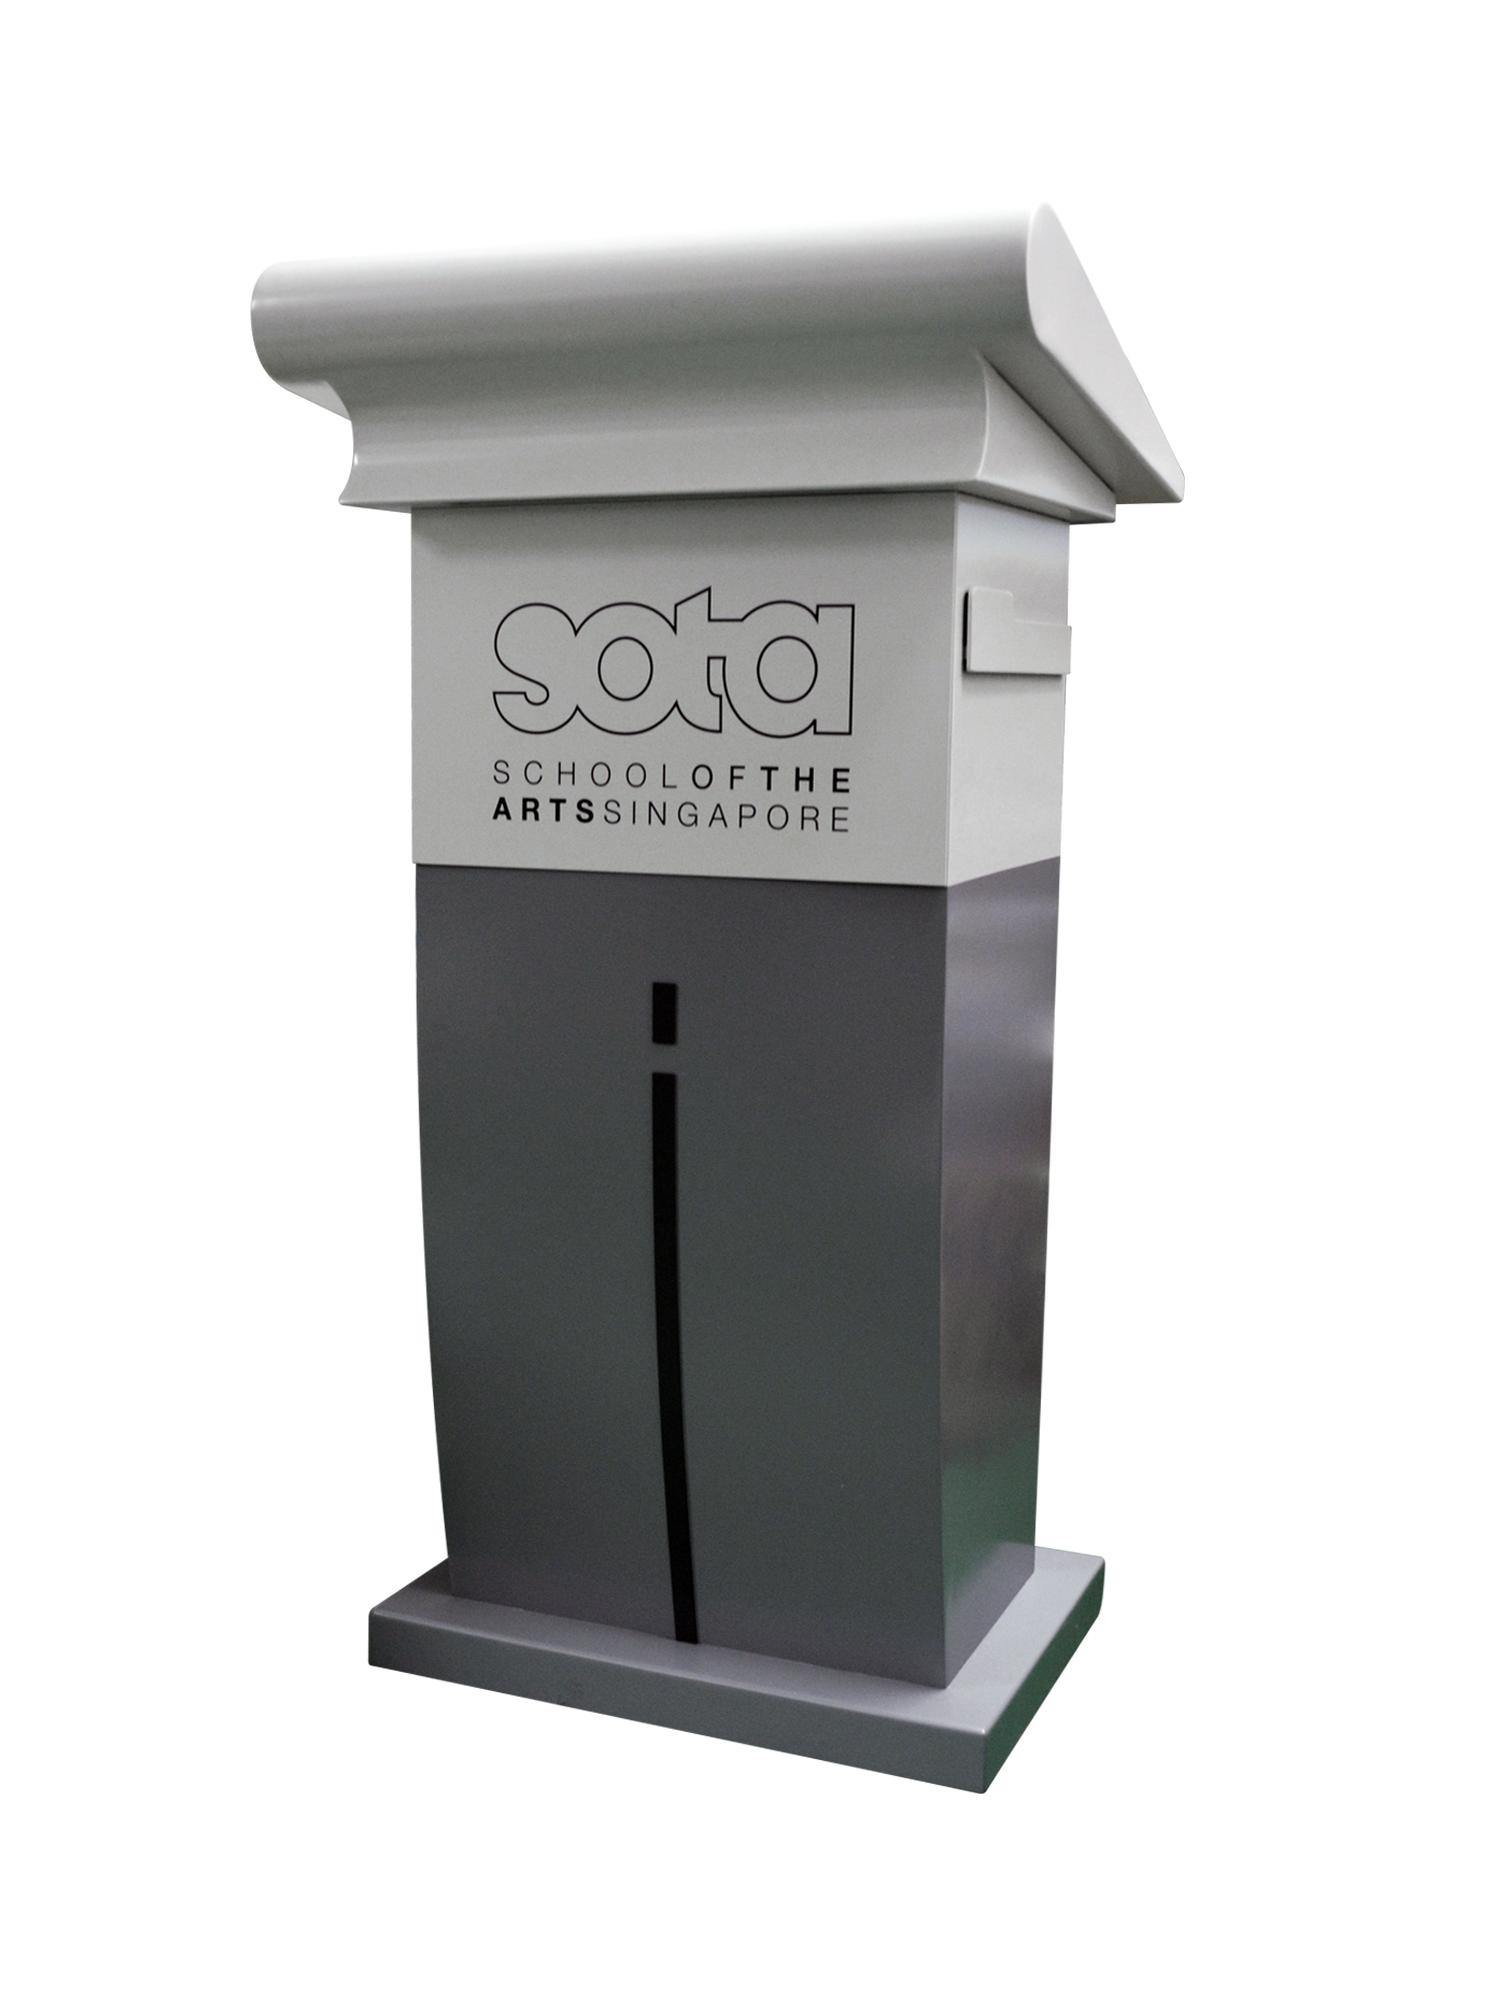 School of the Arts Singapore (SOTA)